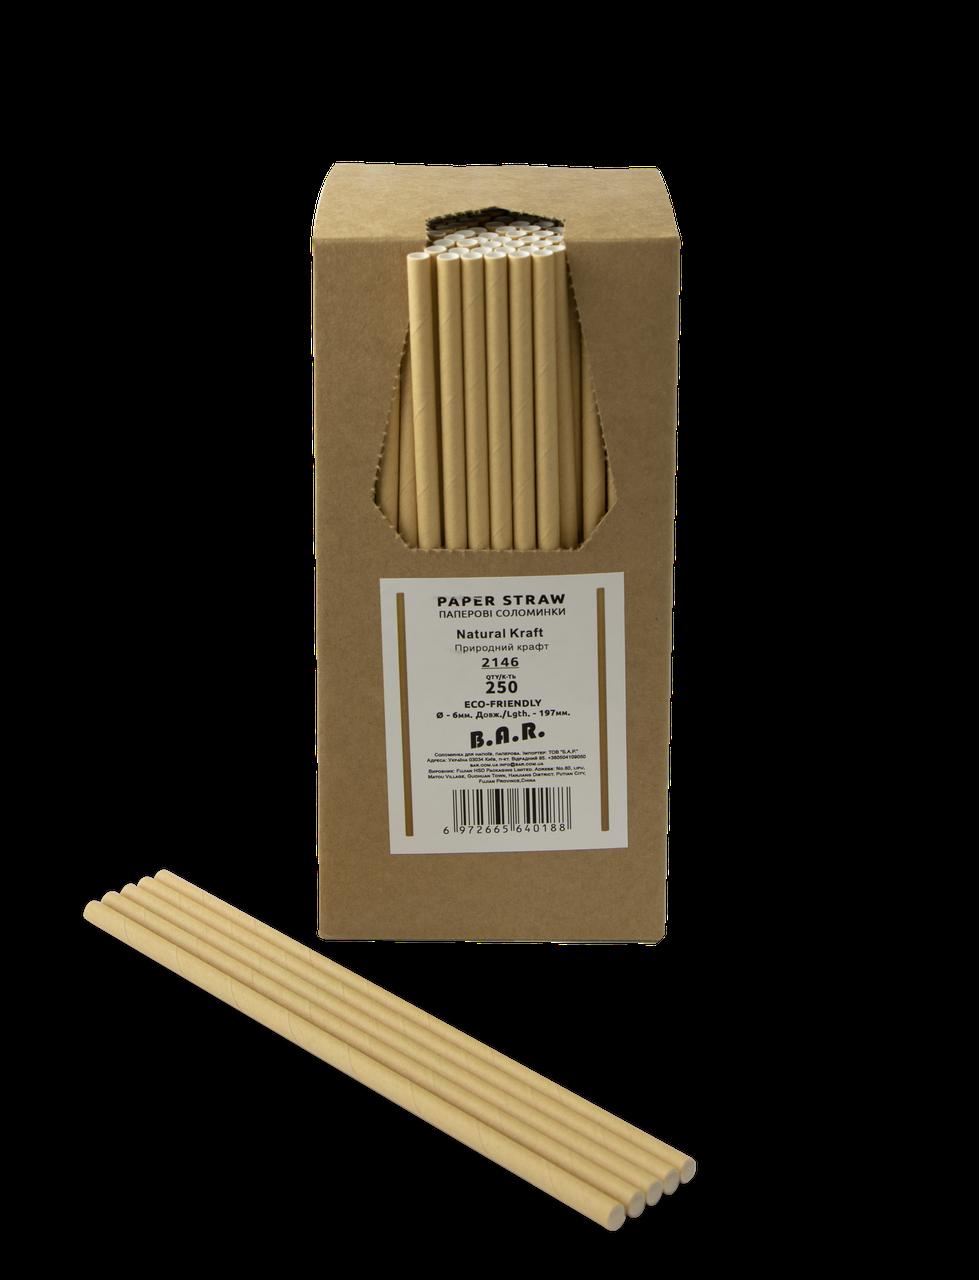 Трубочка бумажная B.A.R. 197x6 мм, 250 шт. Естественный крафт (2146)